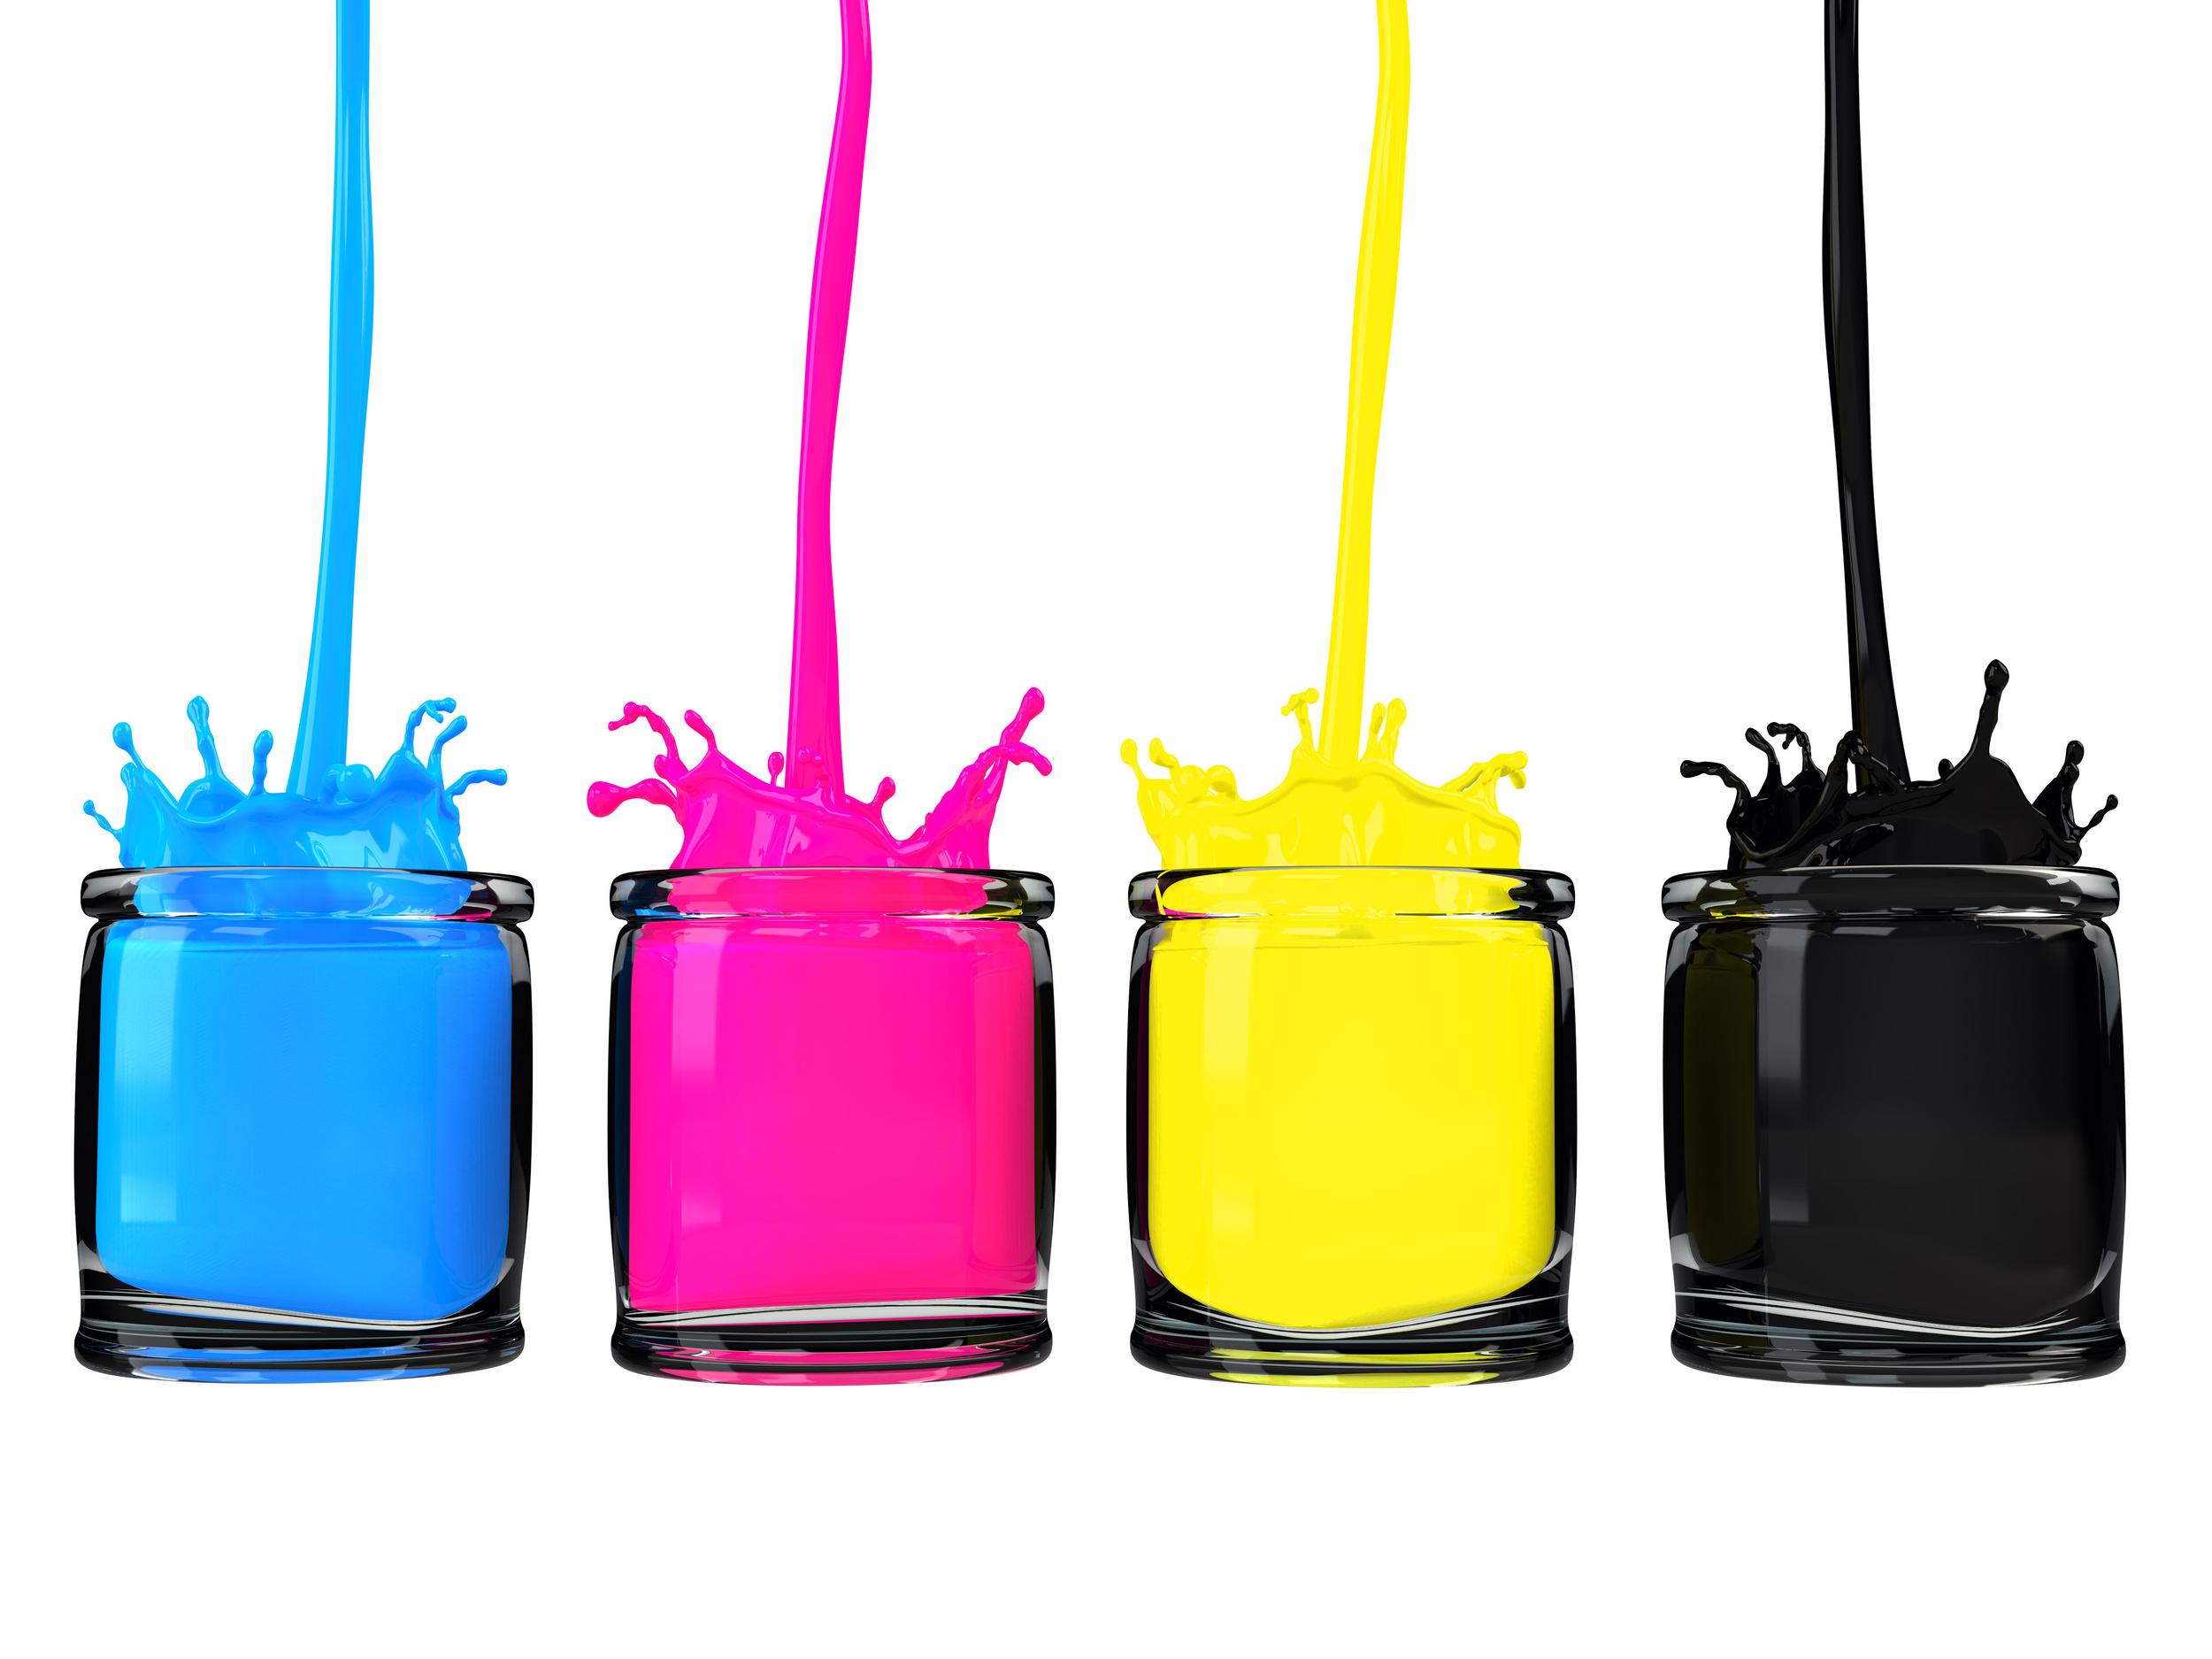 Image-inks-cmyk-jars.jpg